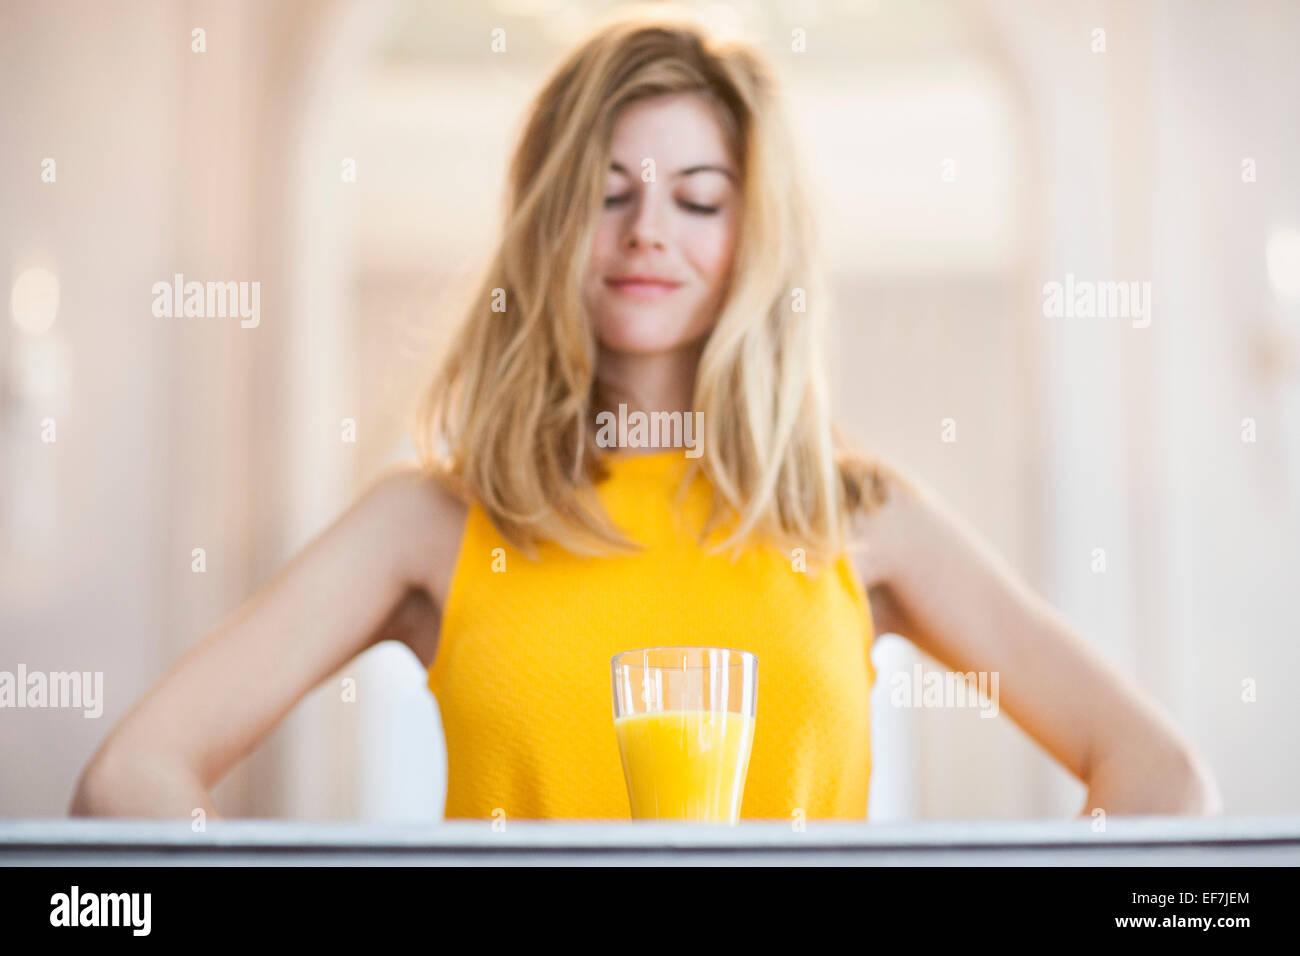 Woman with orange juice - Stock Image